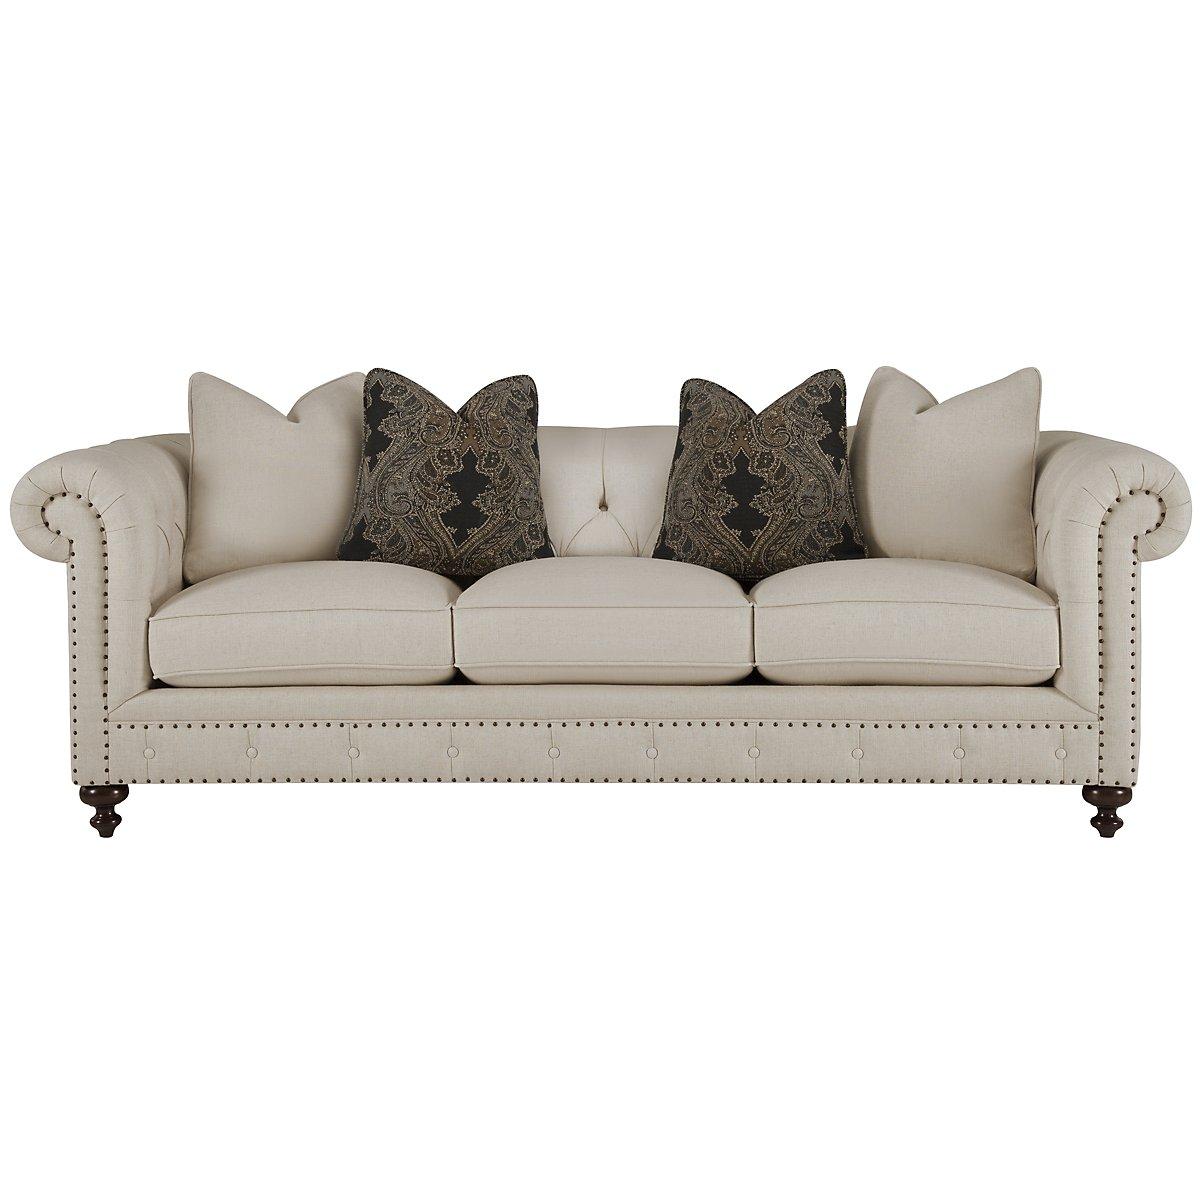 Riviera Light Beige Fabric Small Sofa